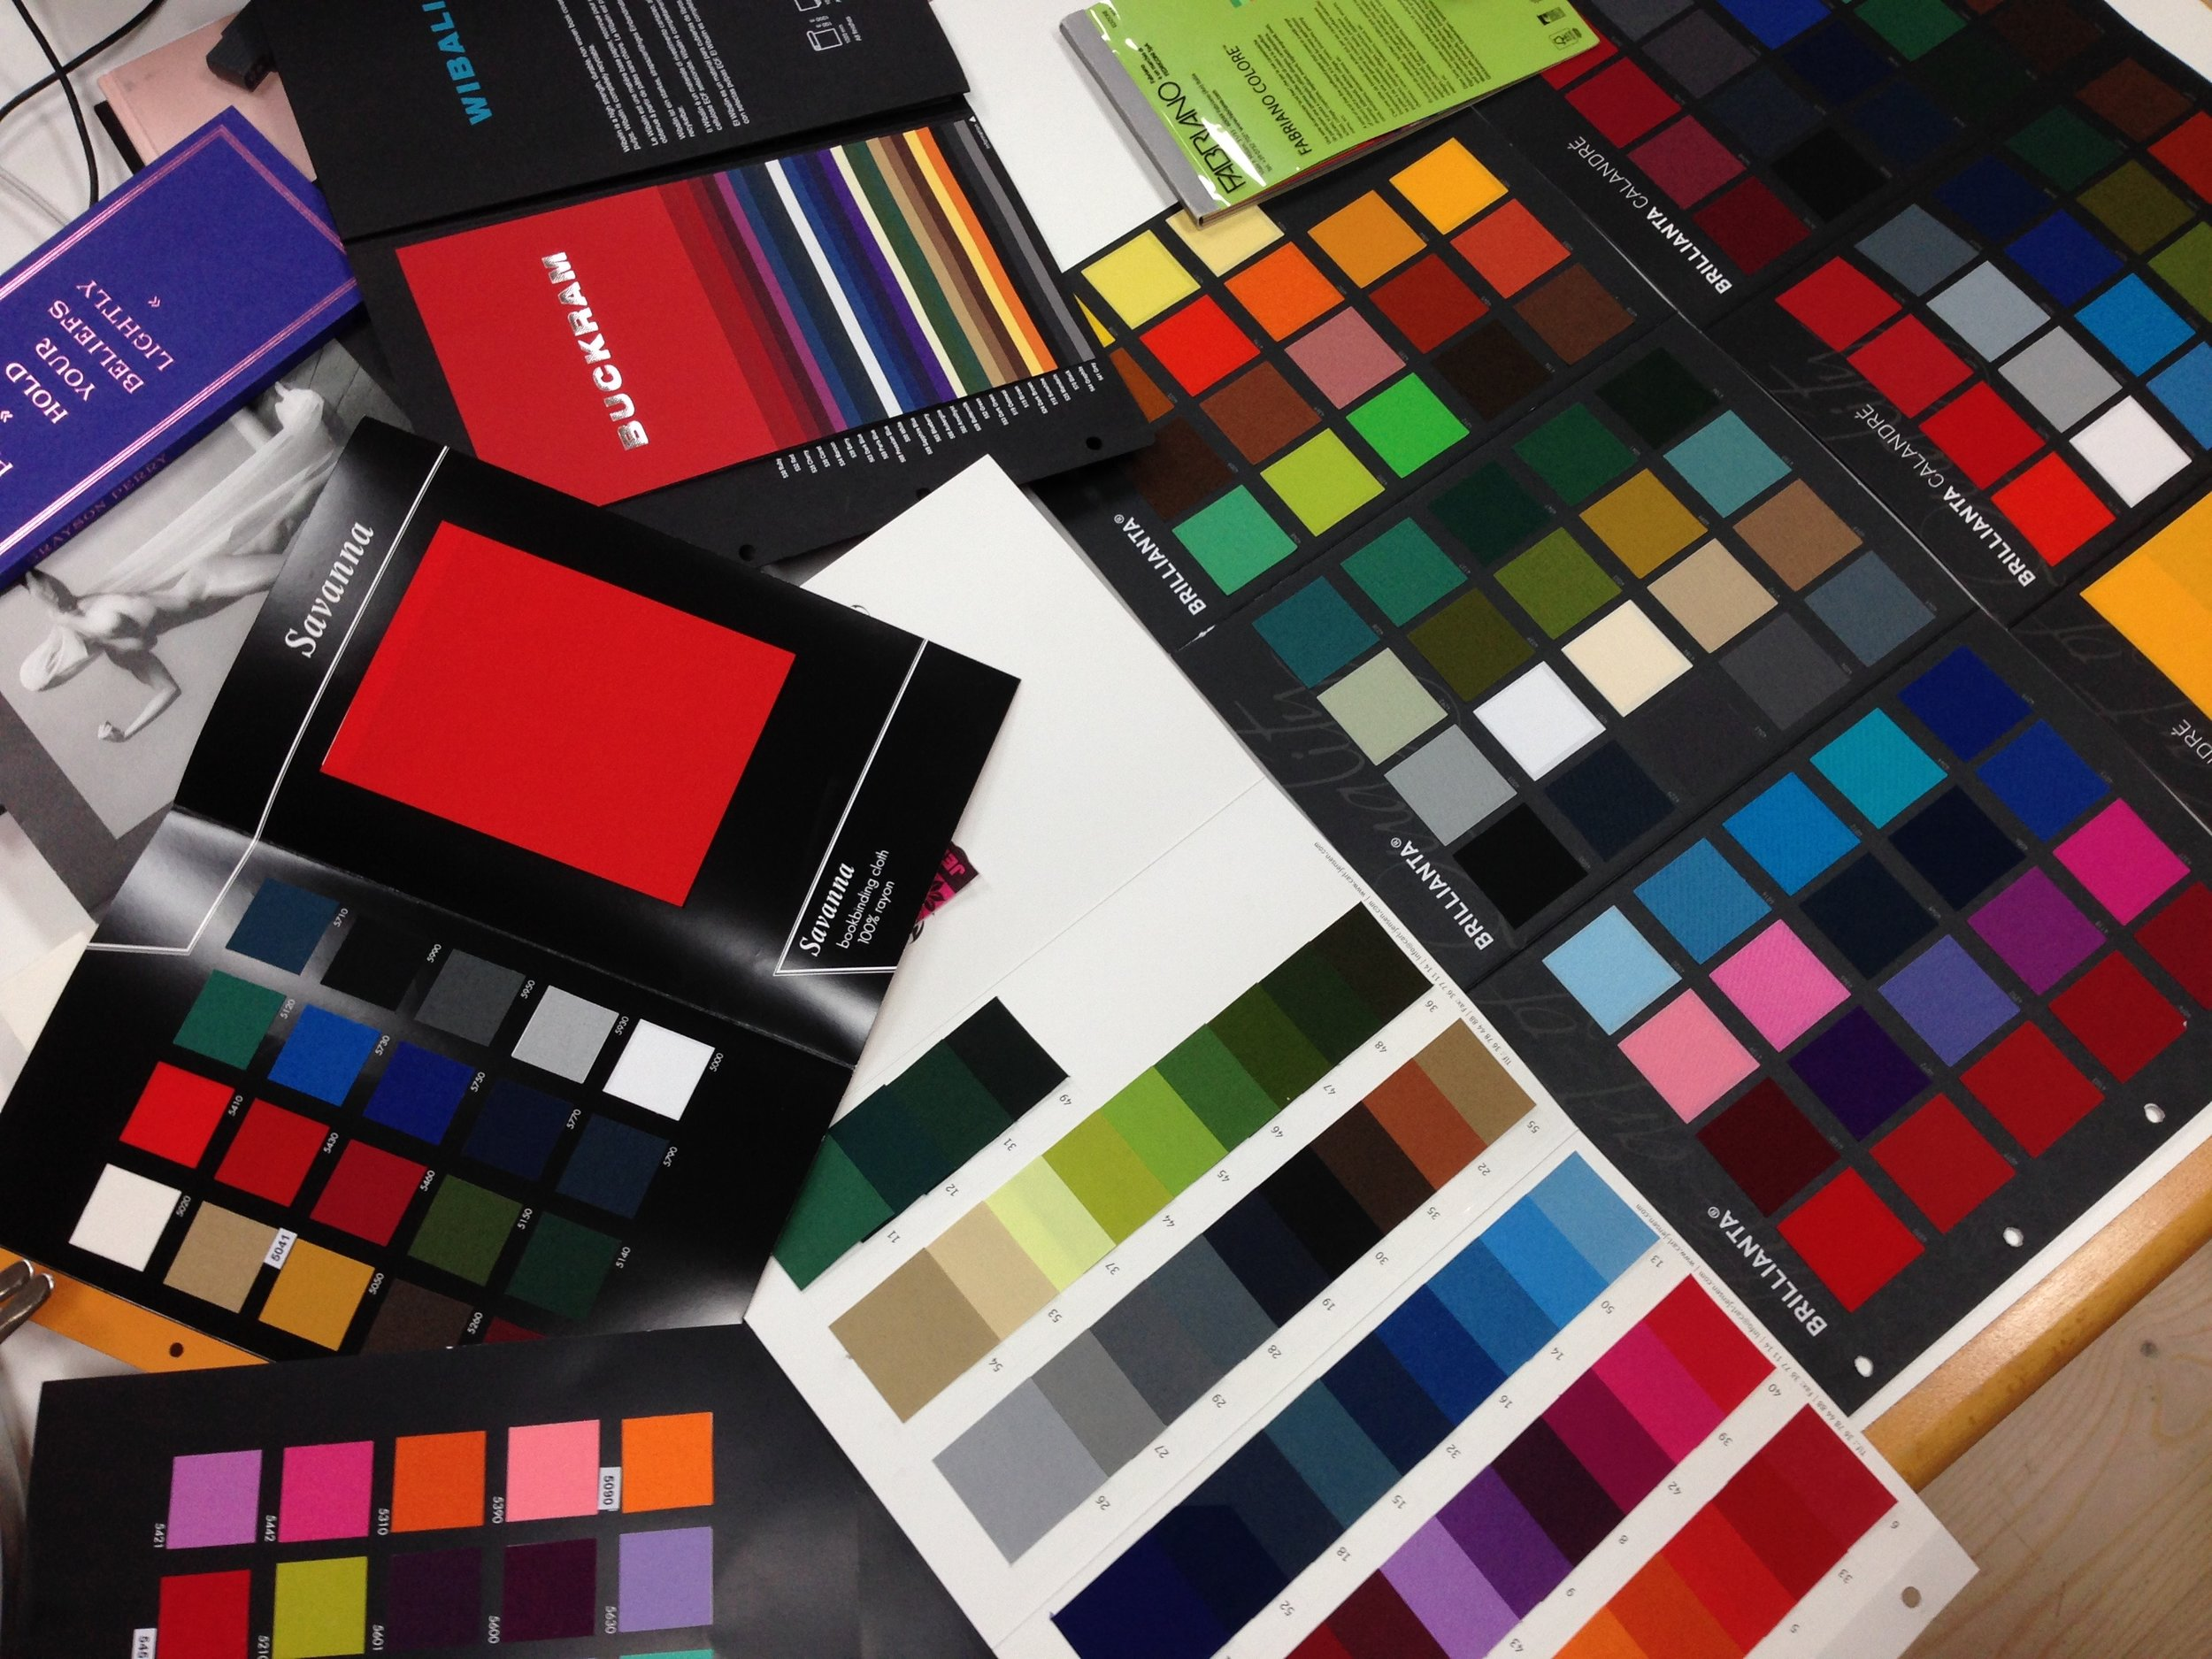 colorswatches_6623.jpg